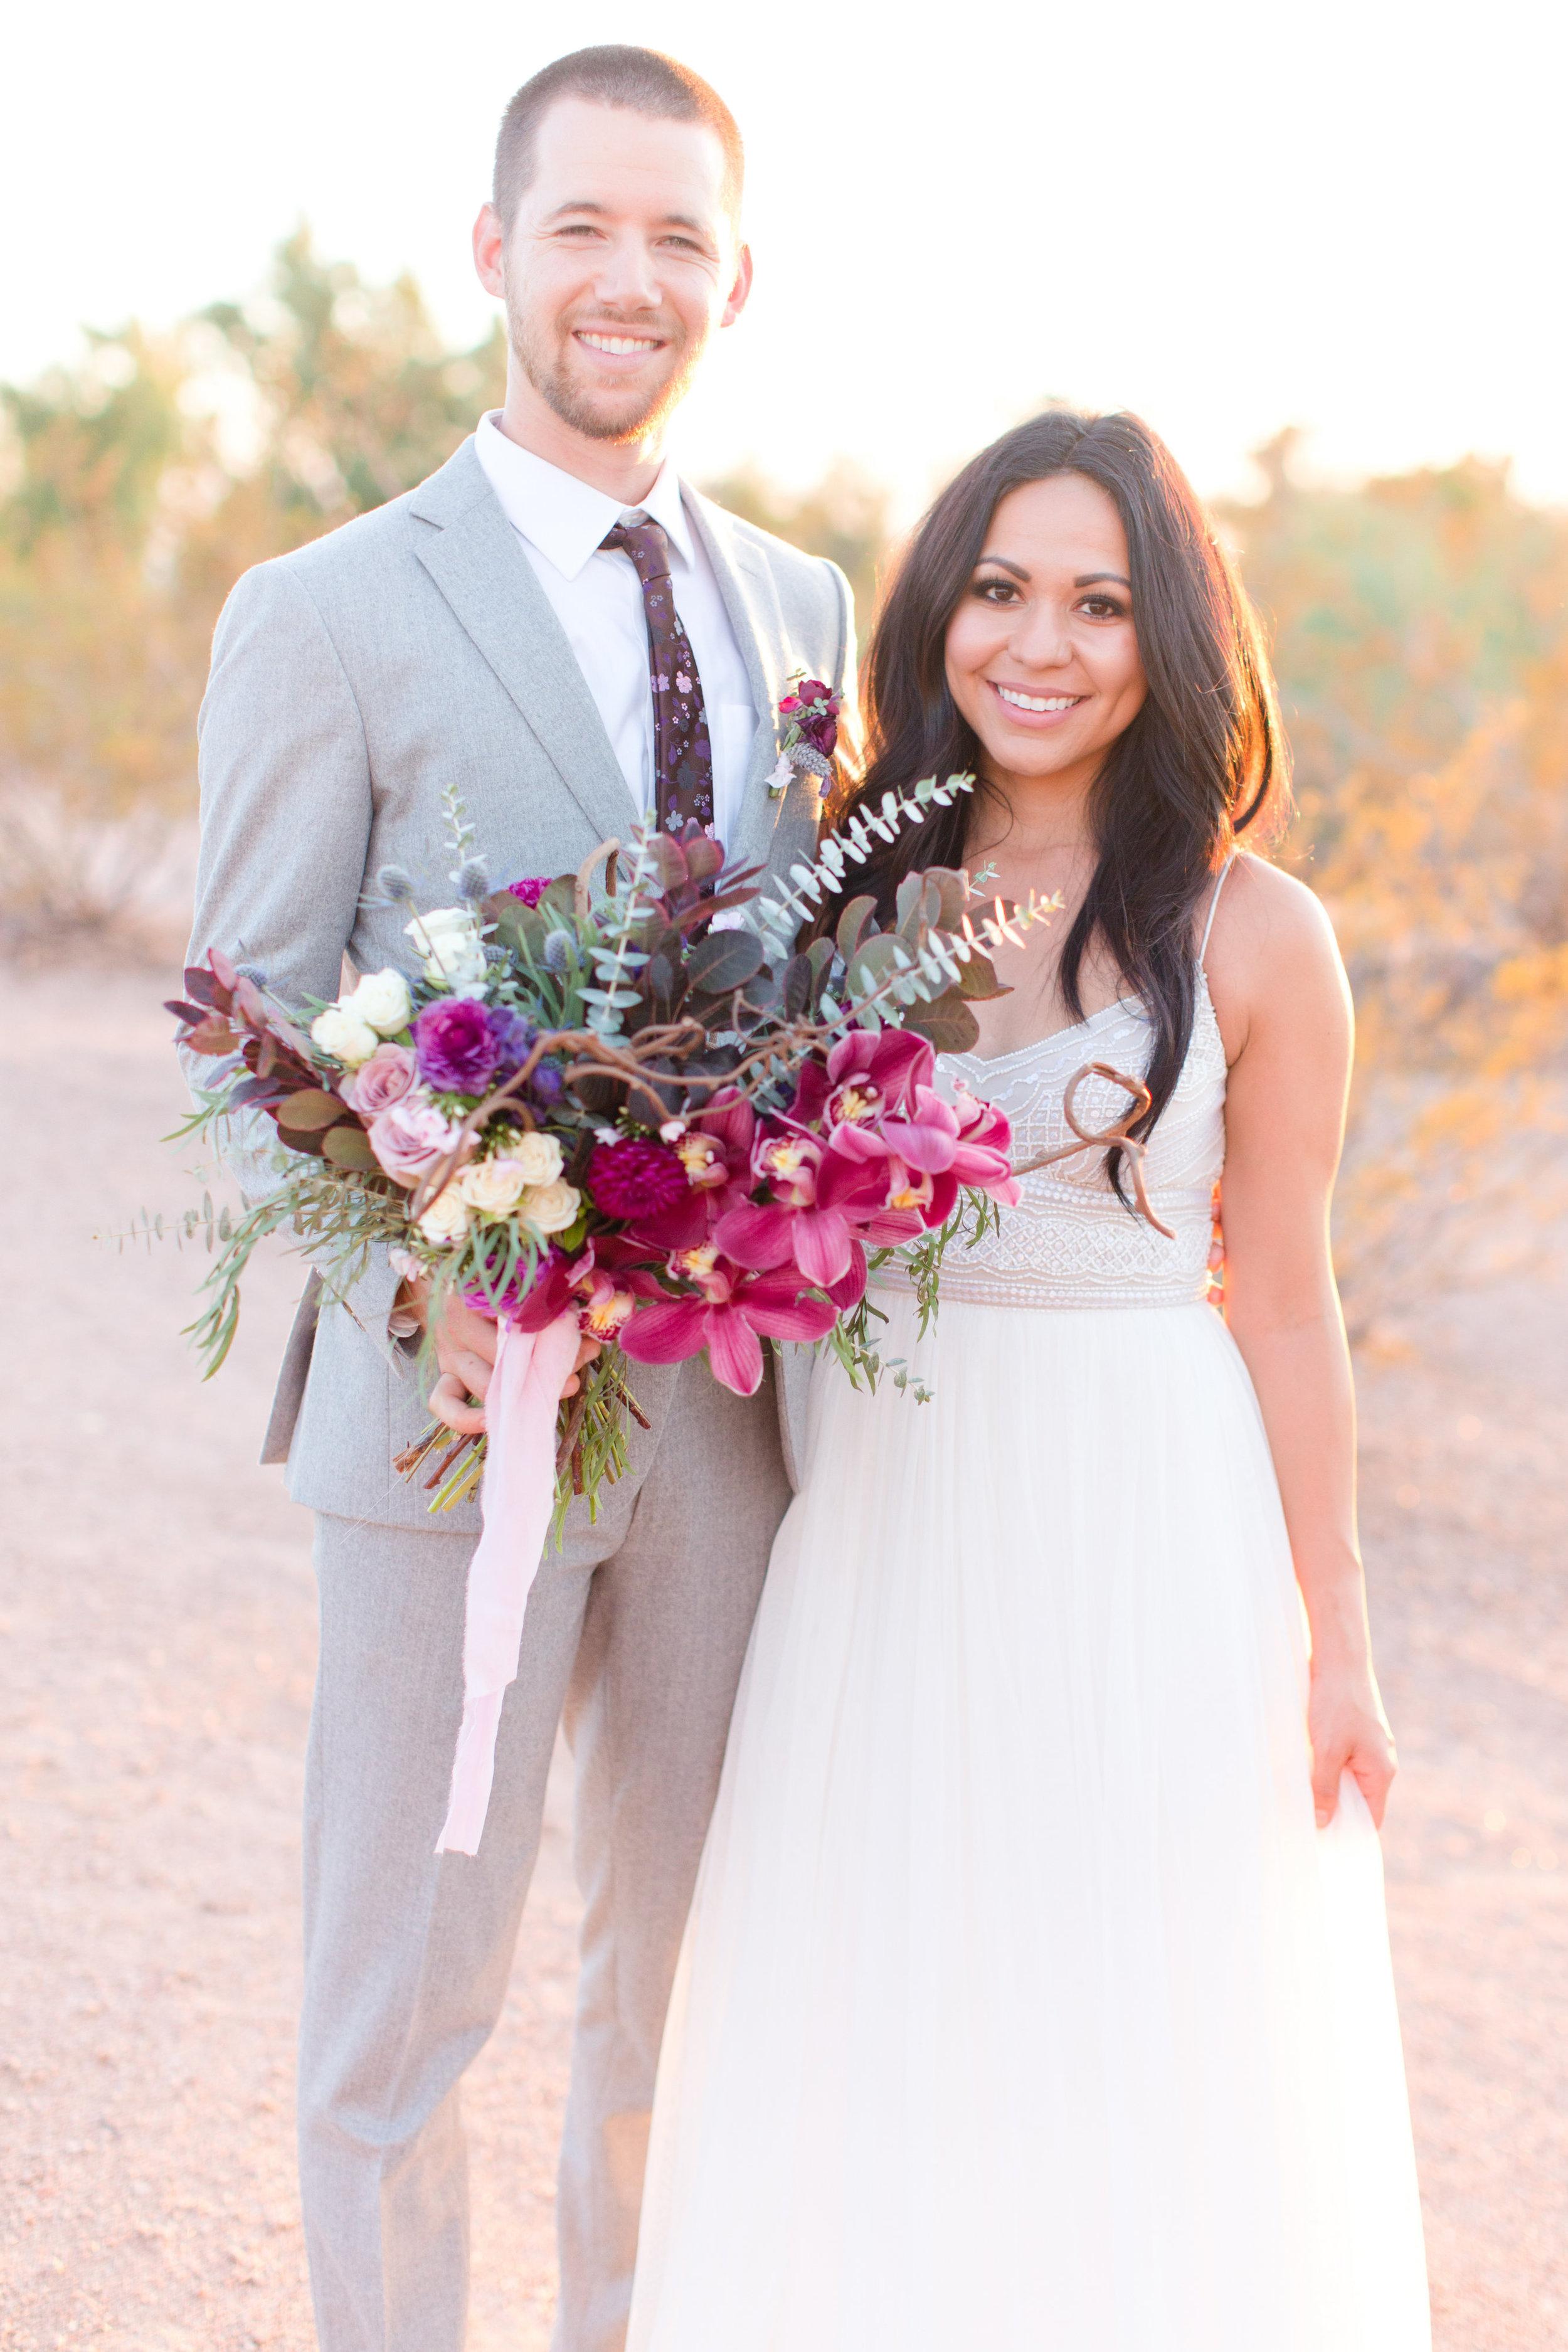 Amy & Jordan Workshop - Purple Anthropologie Inspired Wedding